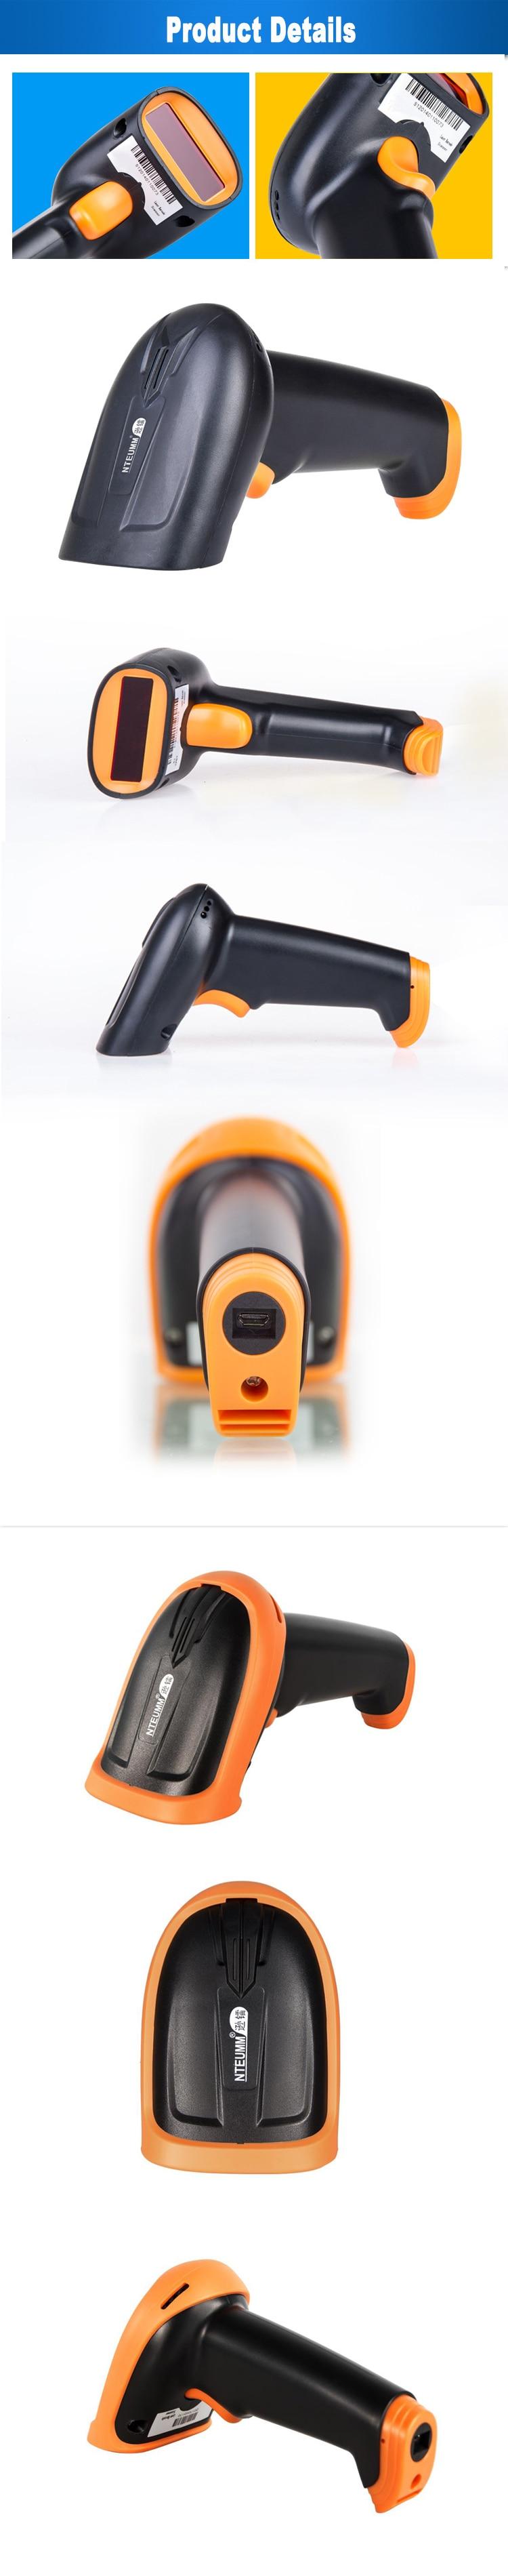 Fio 2.4G Barcode Scanner A Laser com